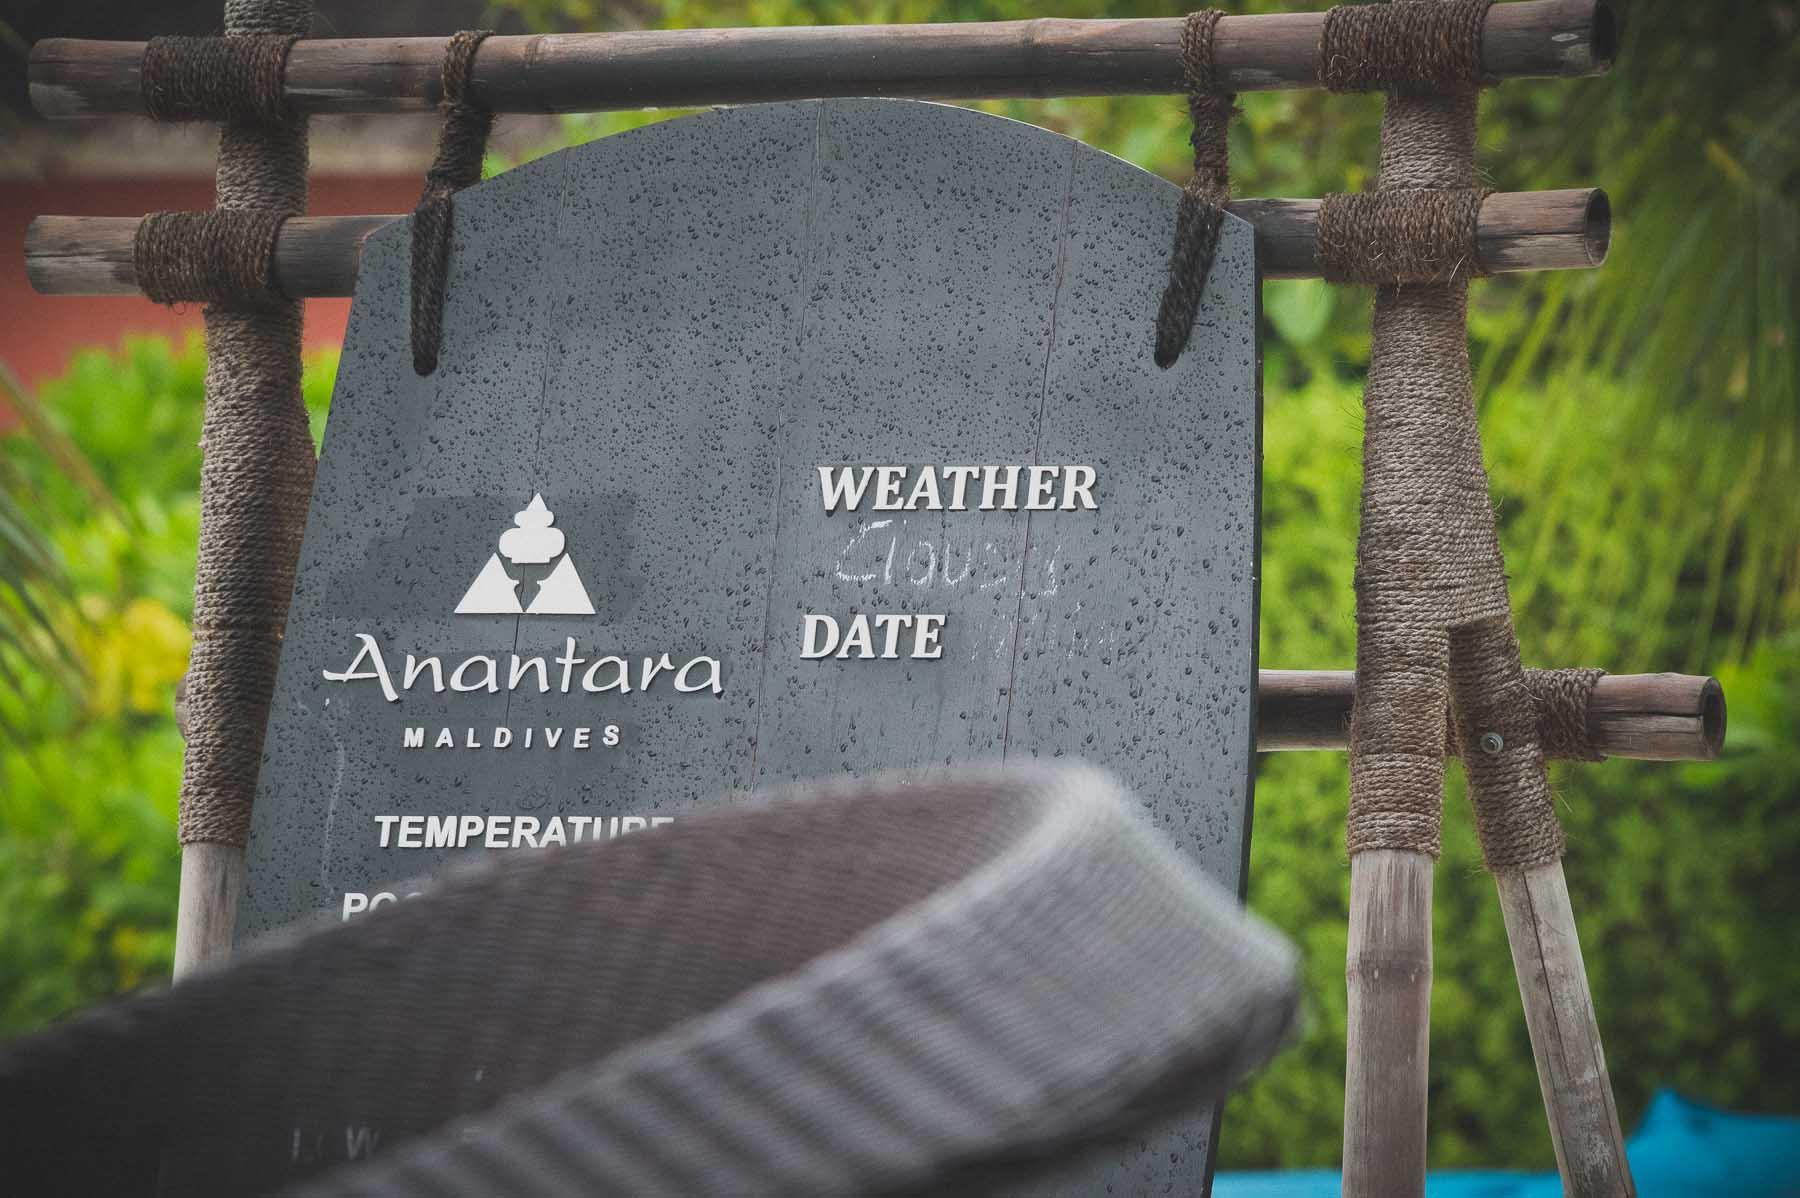 Anantara Maldives Weather report